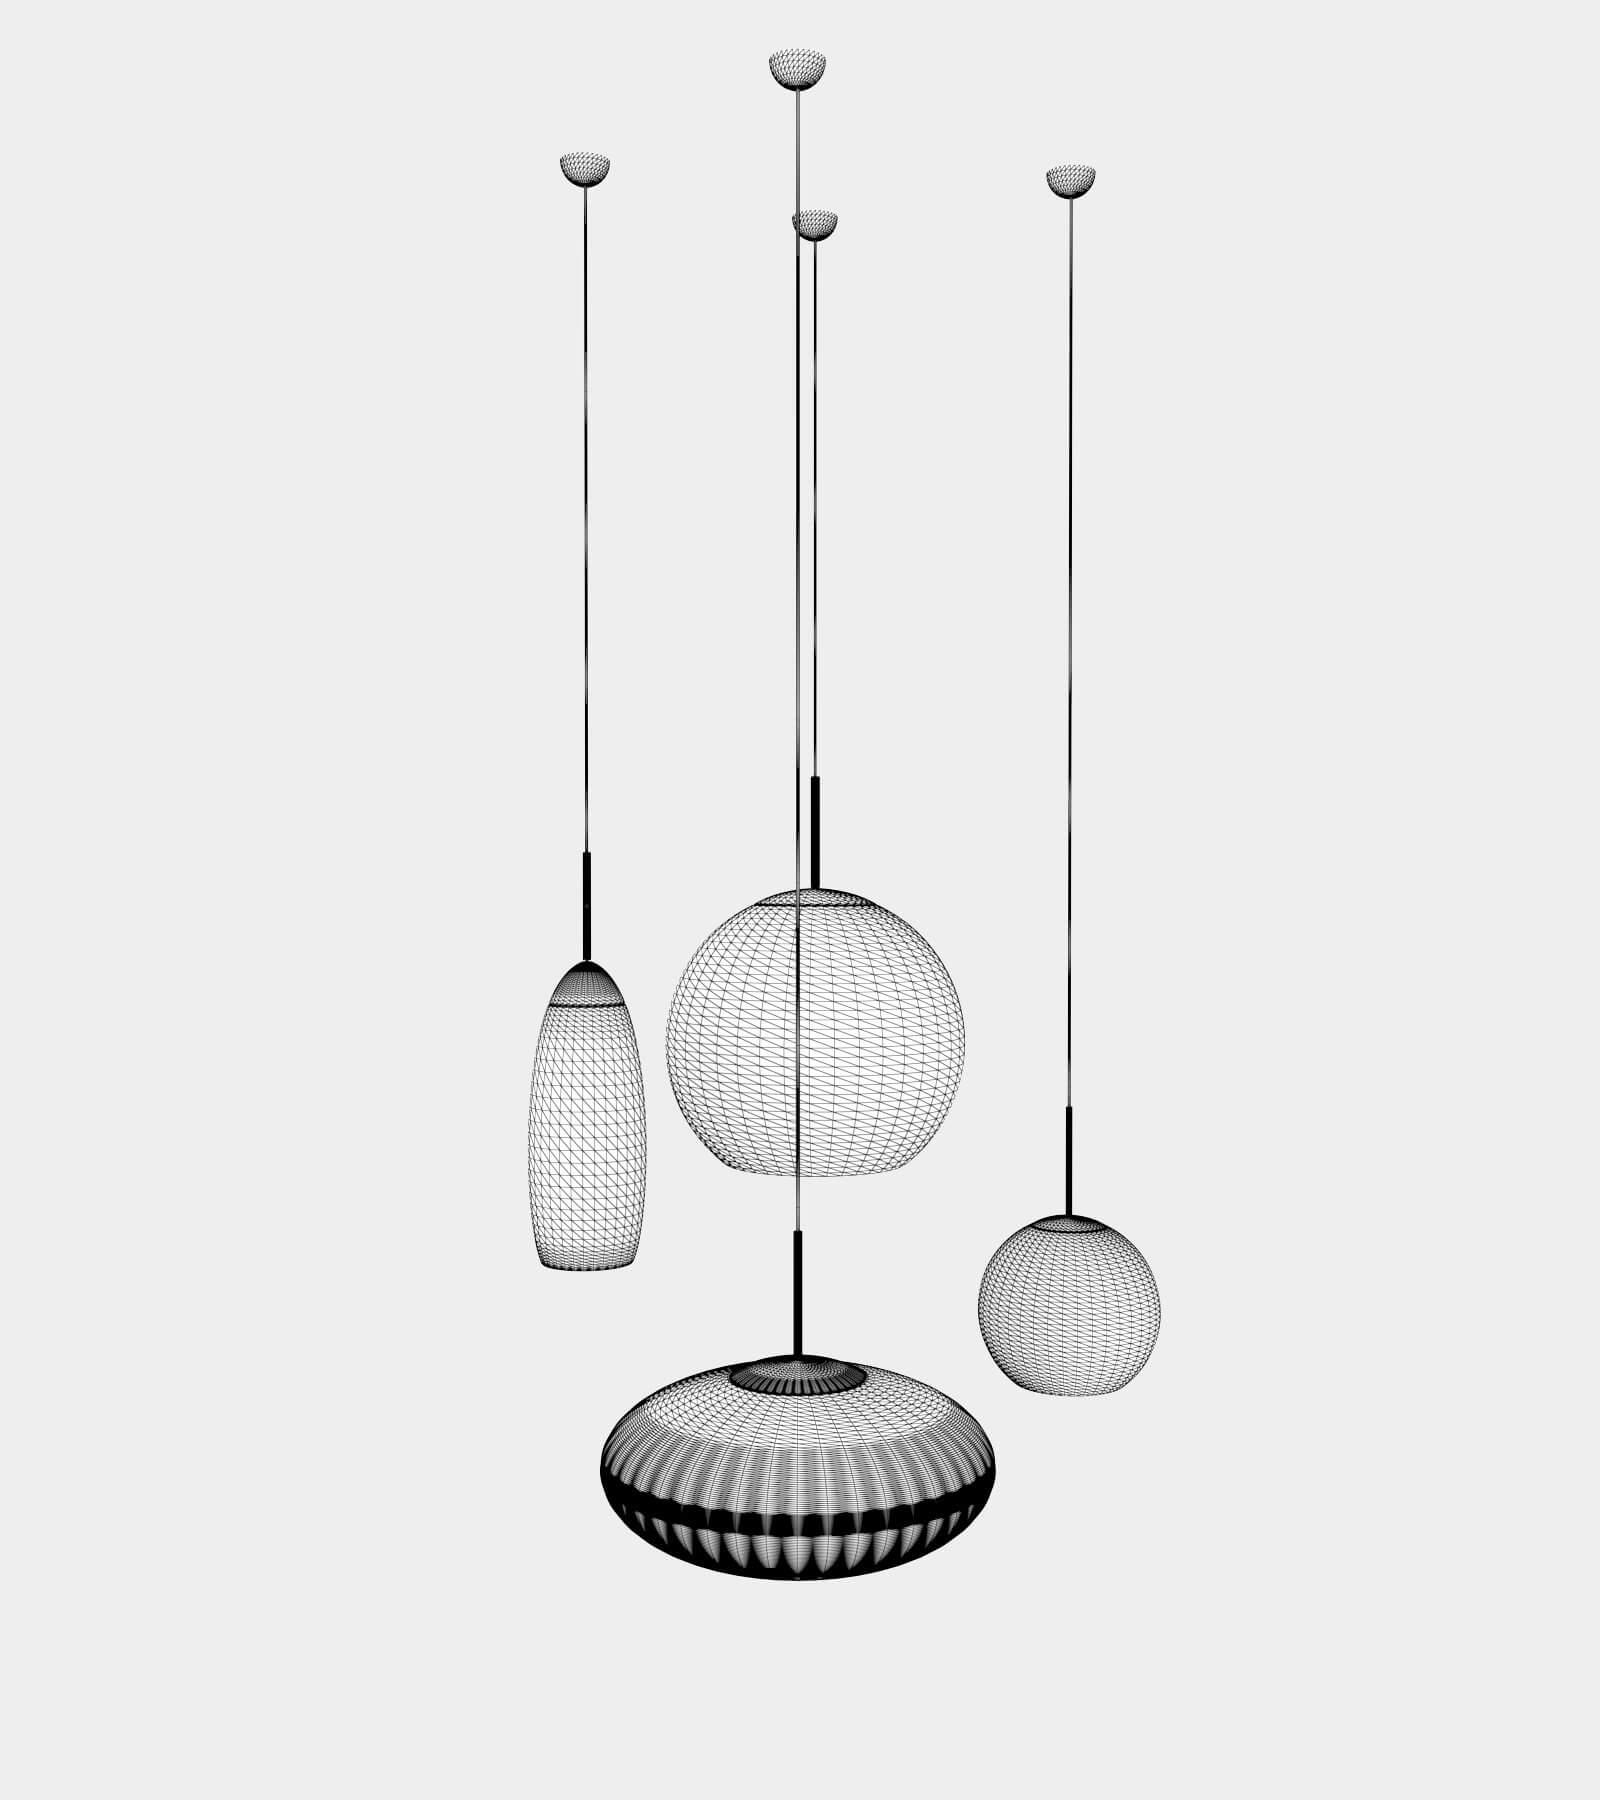 Copper round pendant lamp set-wire-1 3D Model